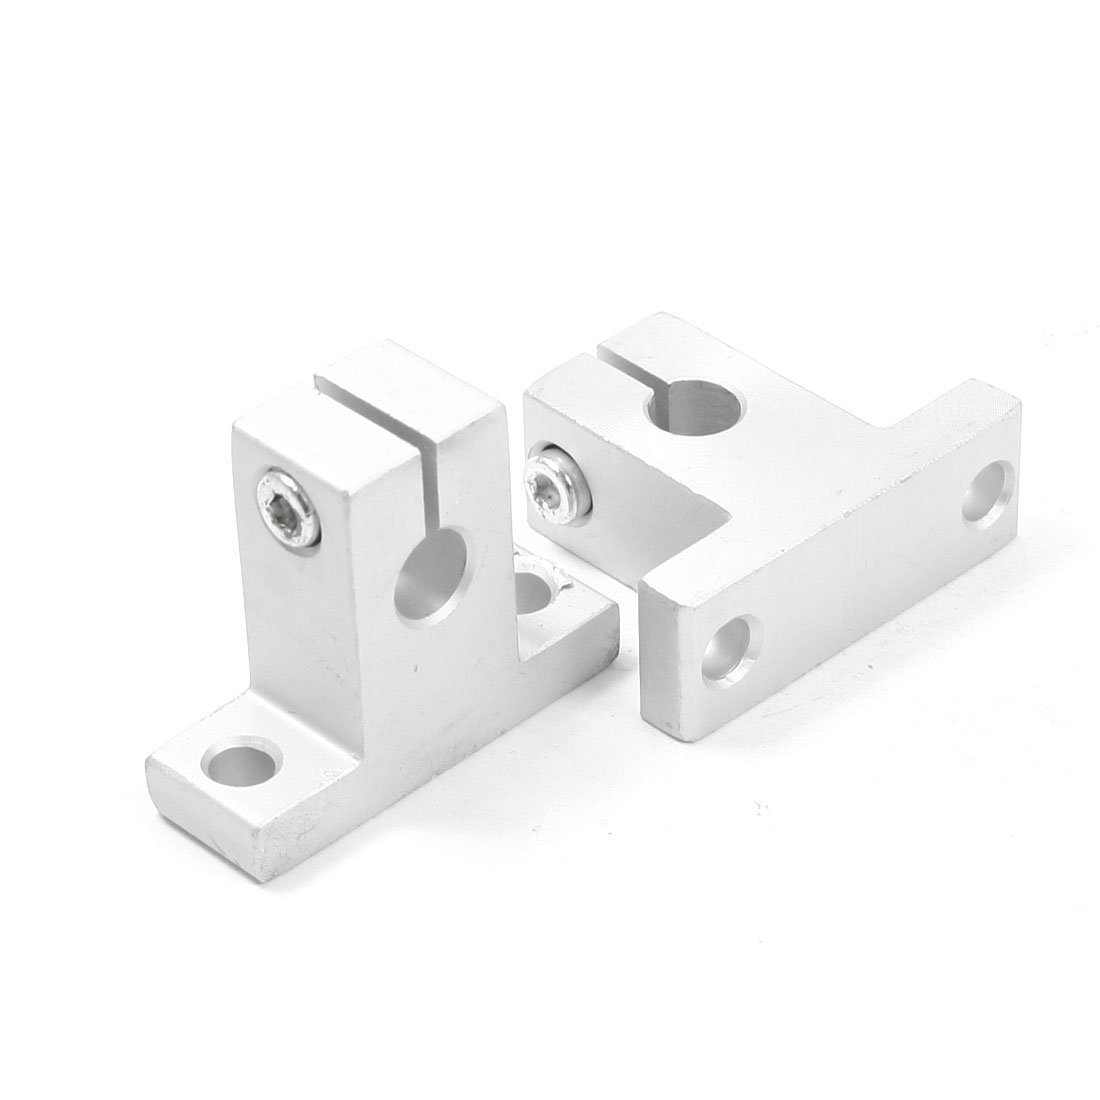 все цены на CNIM Hot 2Pcs SK8 8mm Linear Rail Shaft Clamping Guide Support for XYZ Table онлайн